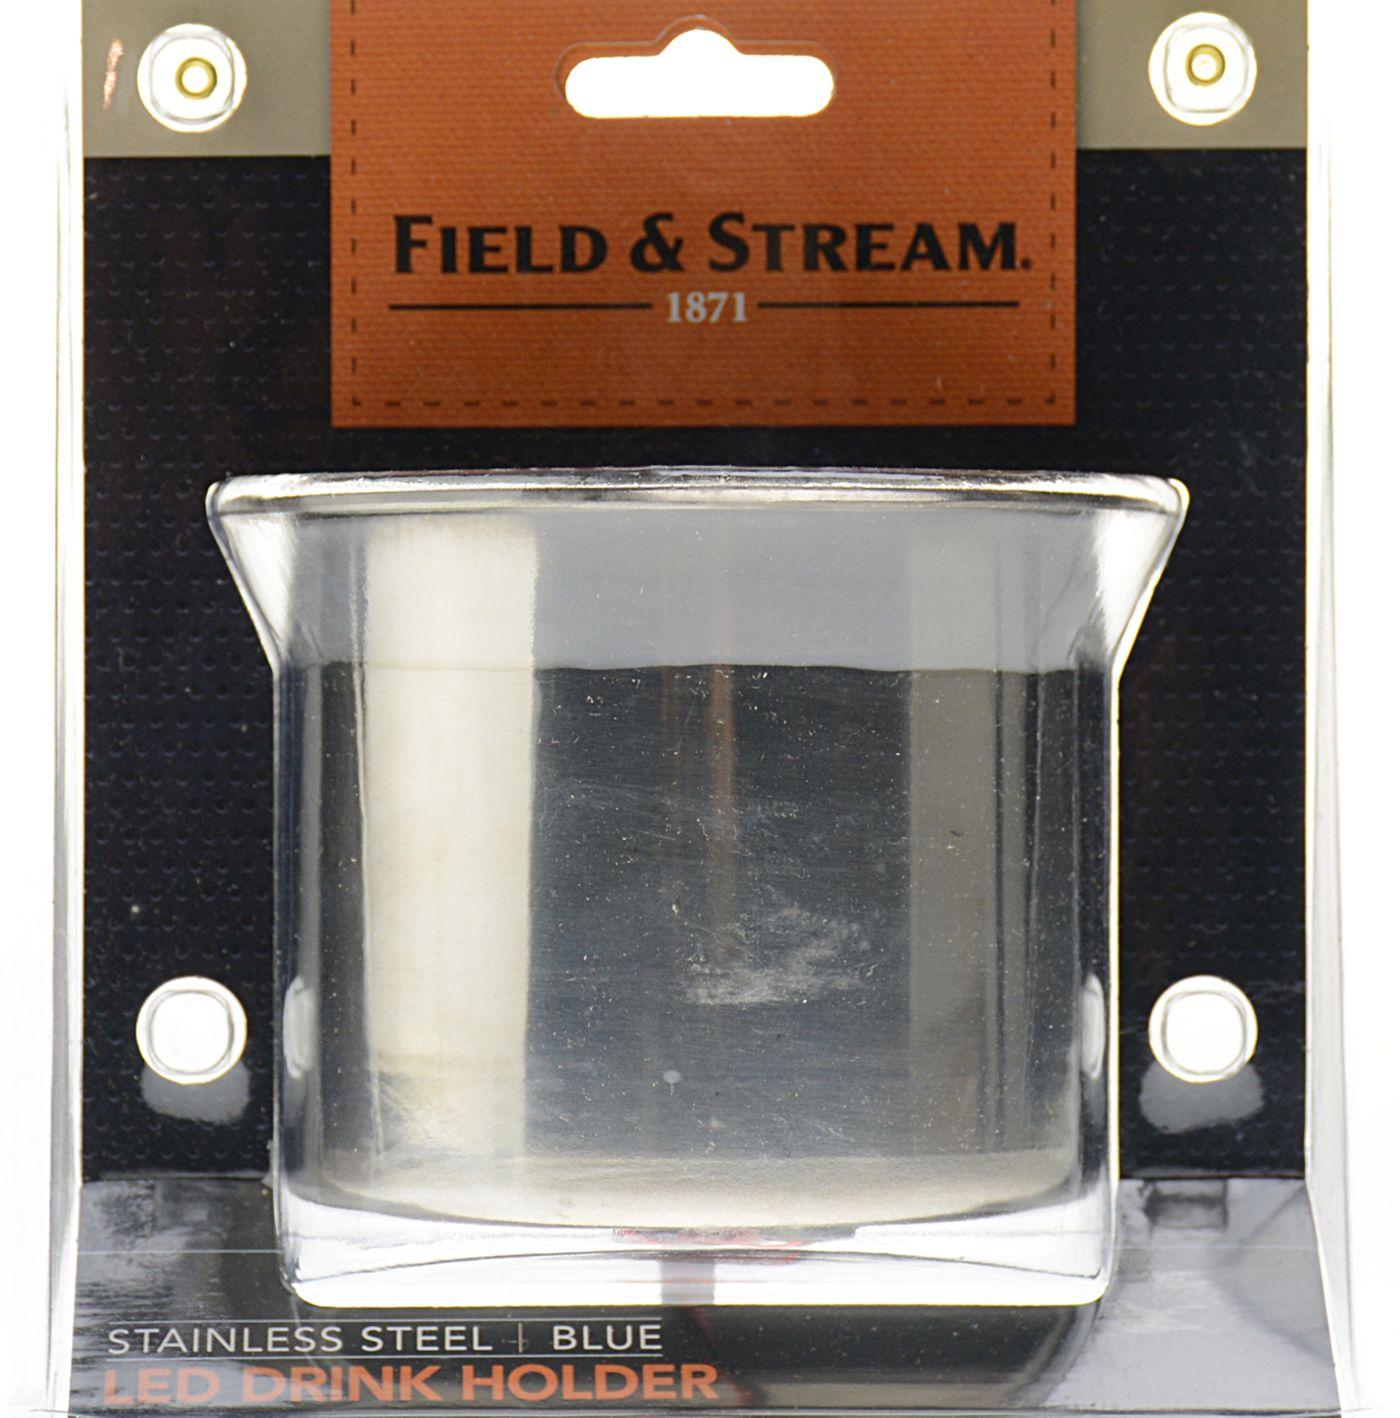 Field & Stream LED Drink Holder